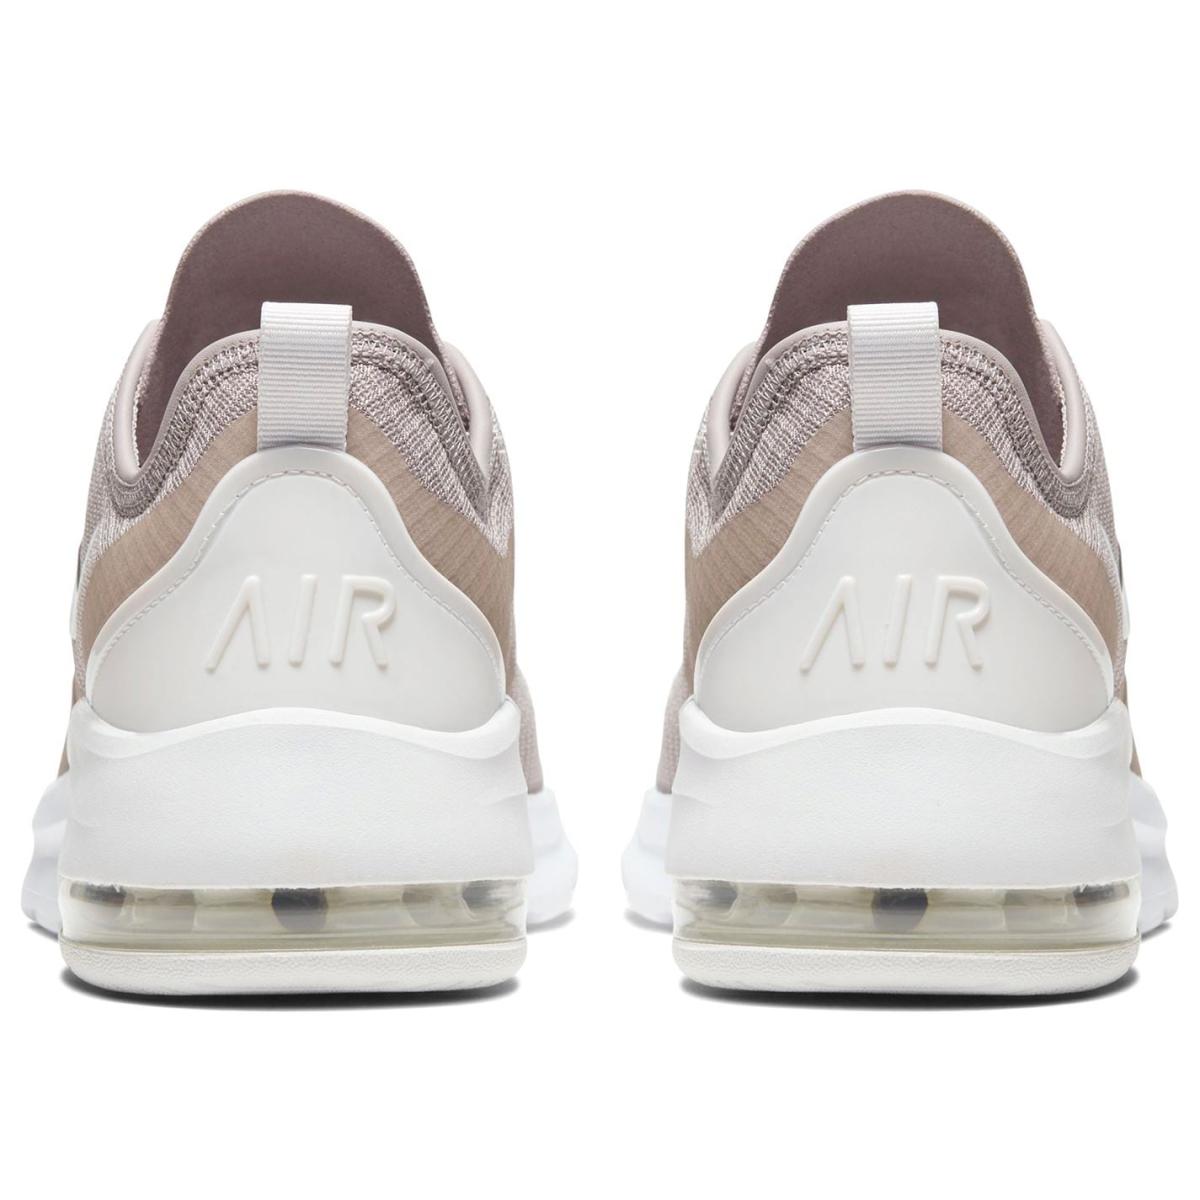 Nike-Air-Max-Motion-2-Turnschuhe-Damen-Sneaker-Sportschuhe-Laufschuhe-4024 Indexbild 7